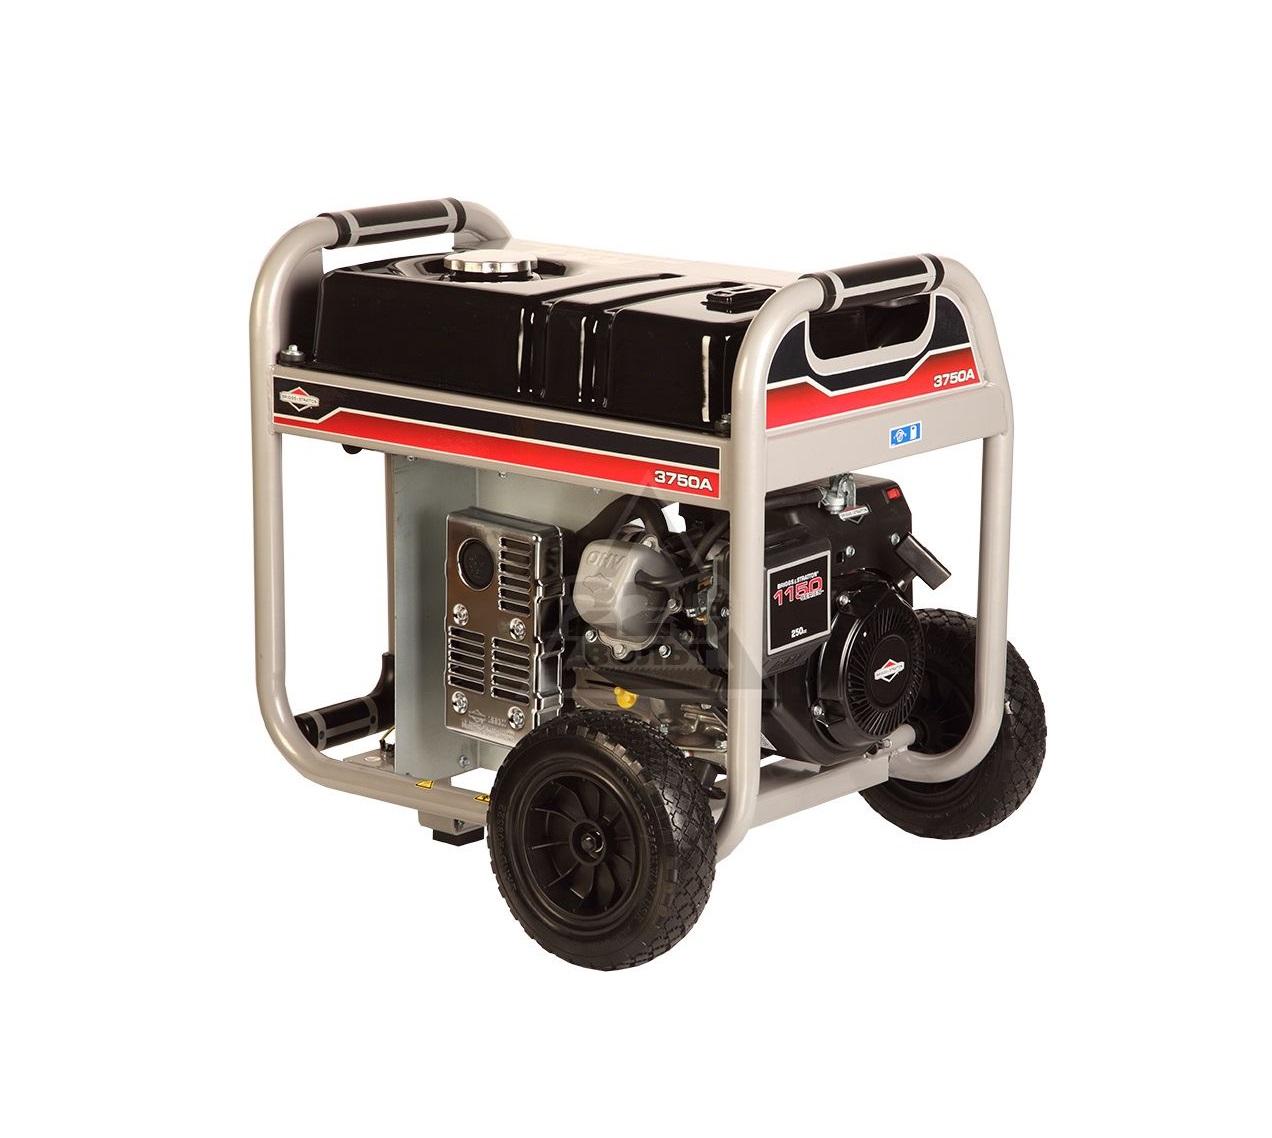 Бензиновый генератор (Бензогенератор) Briggs&Stratton 3750 A